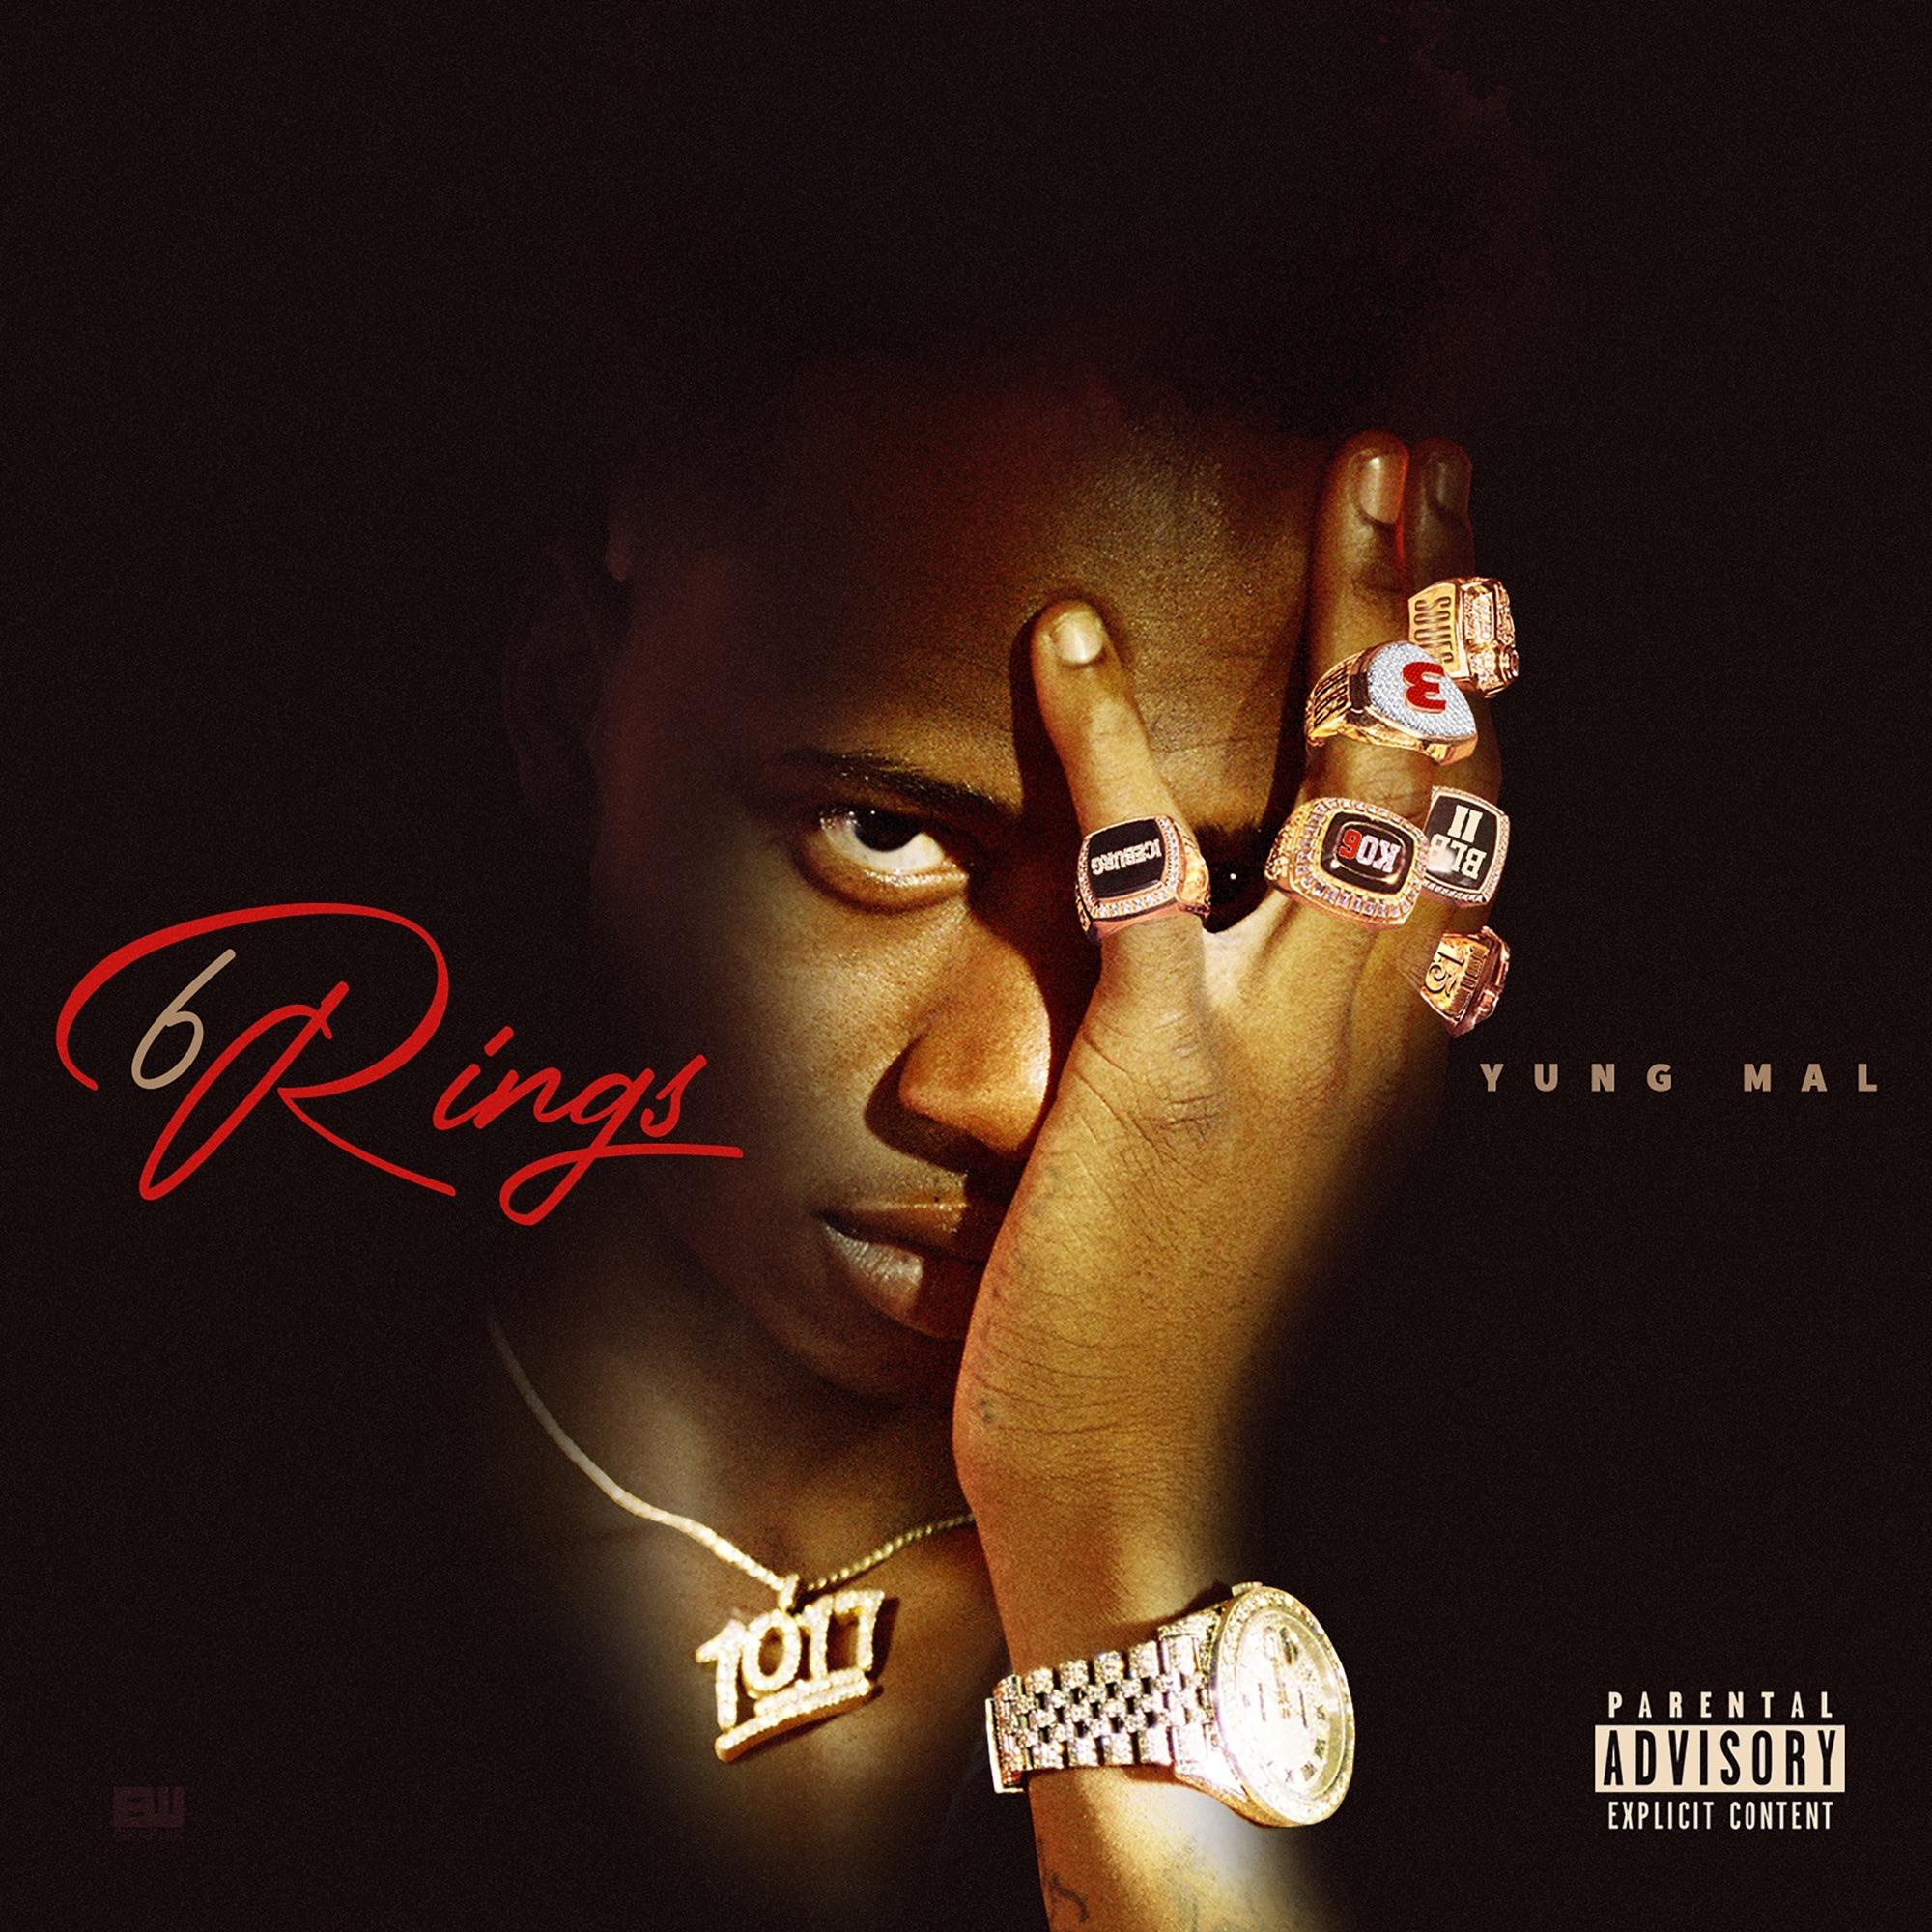 Yung Mal – 6 Rings